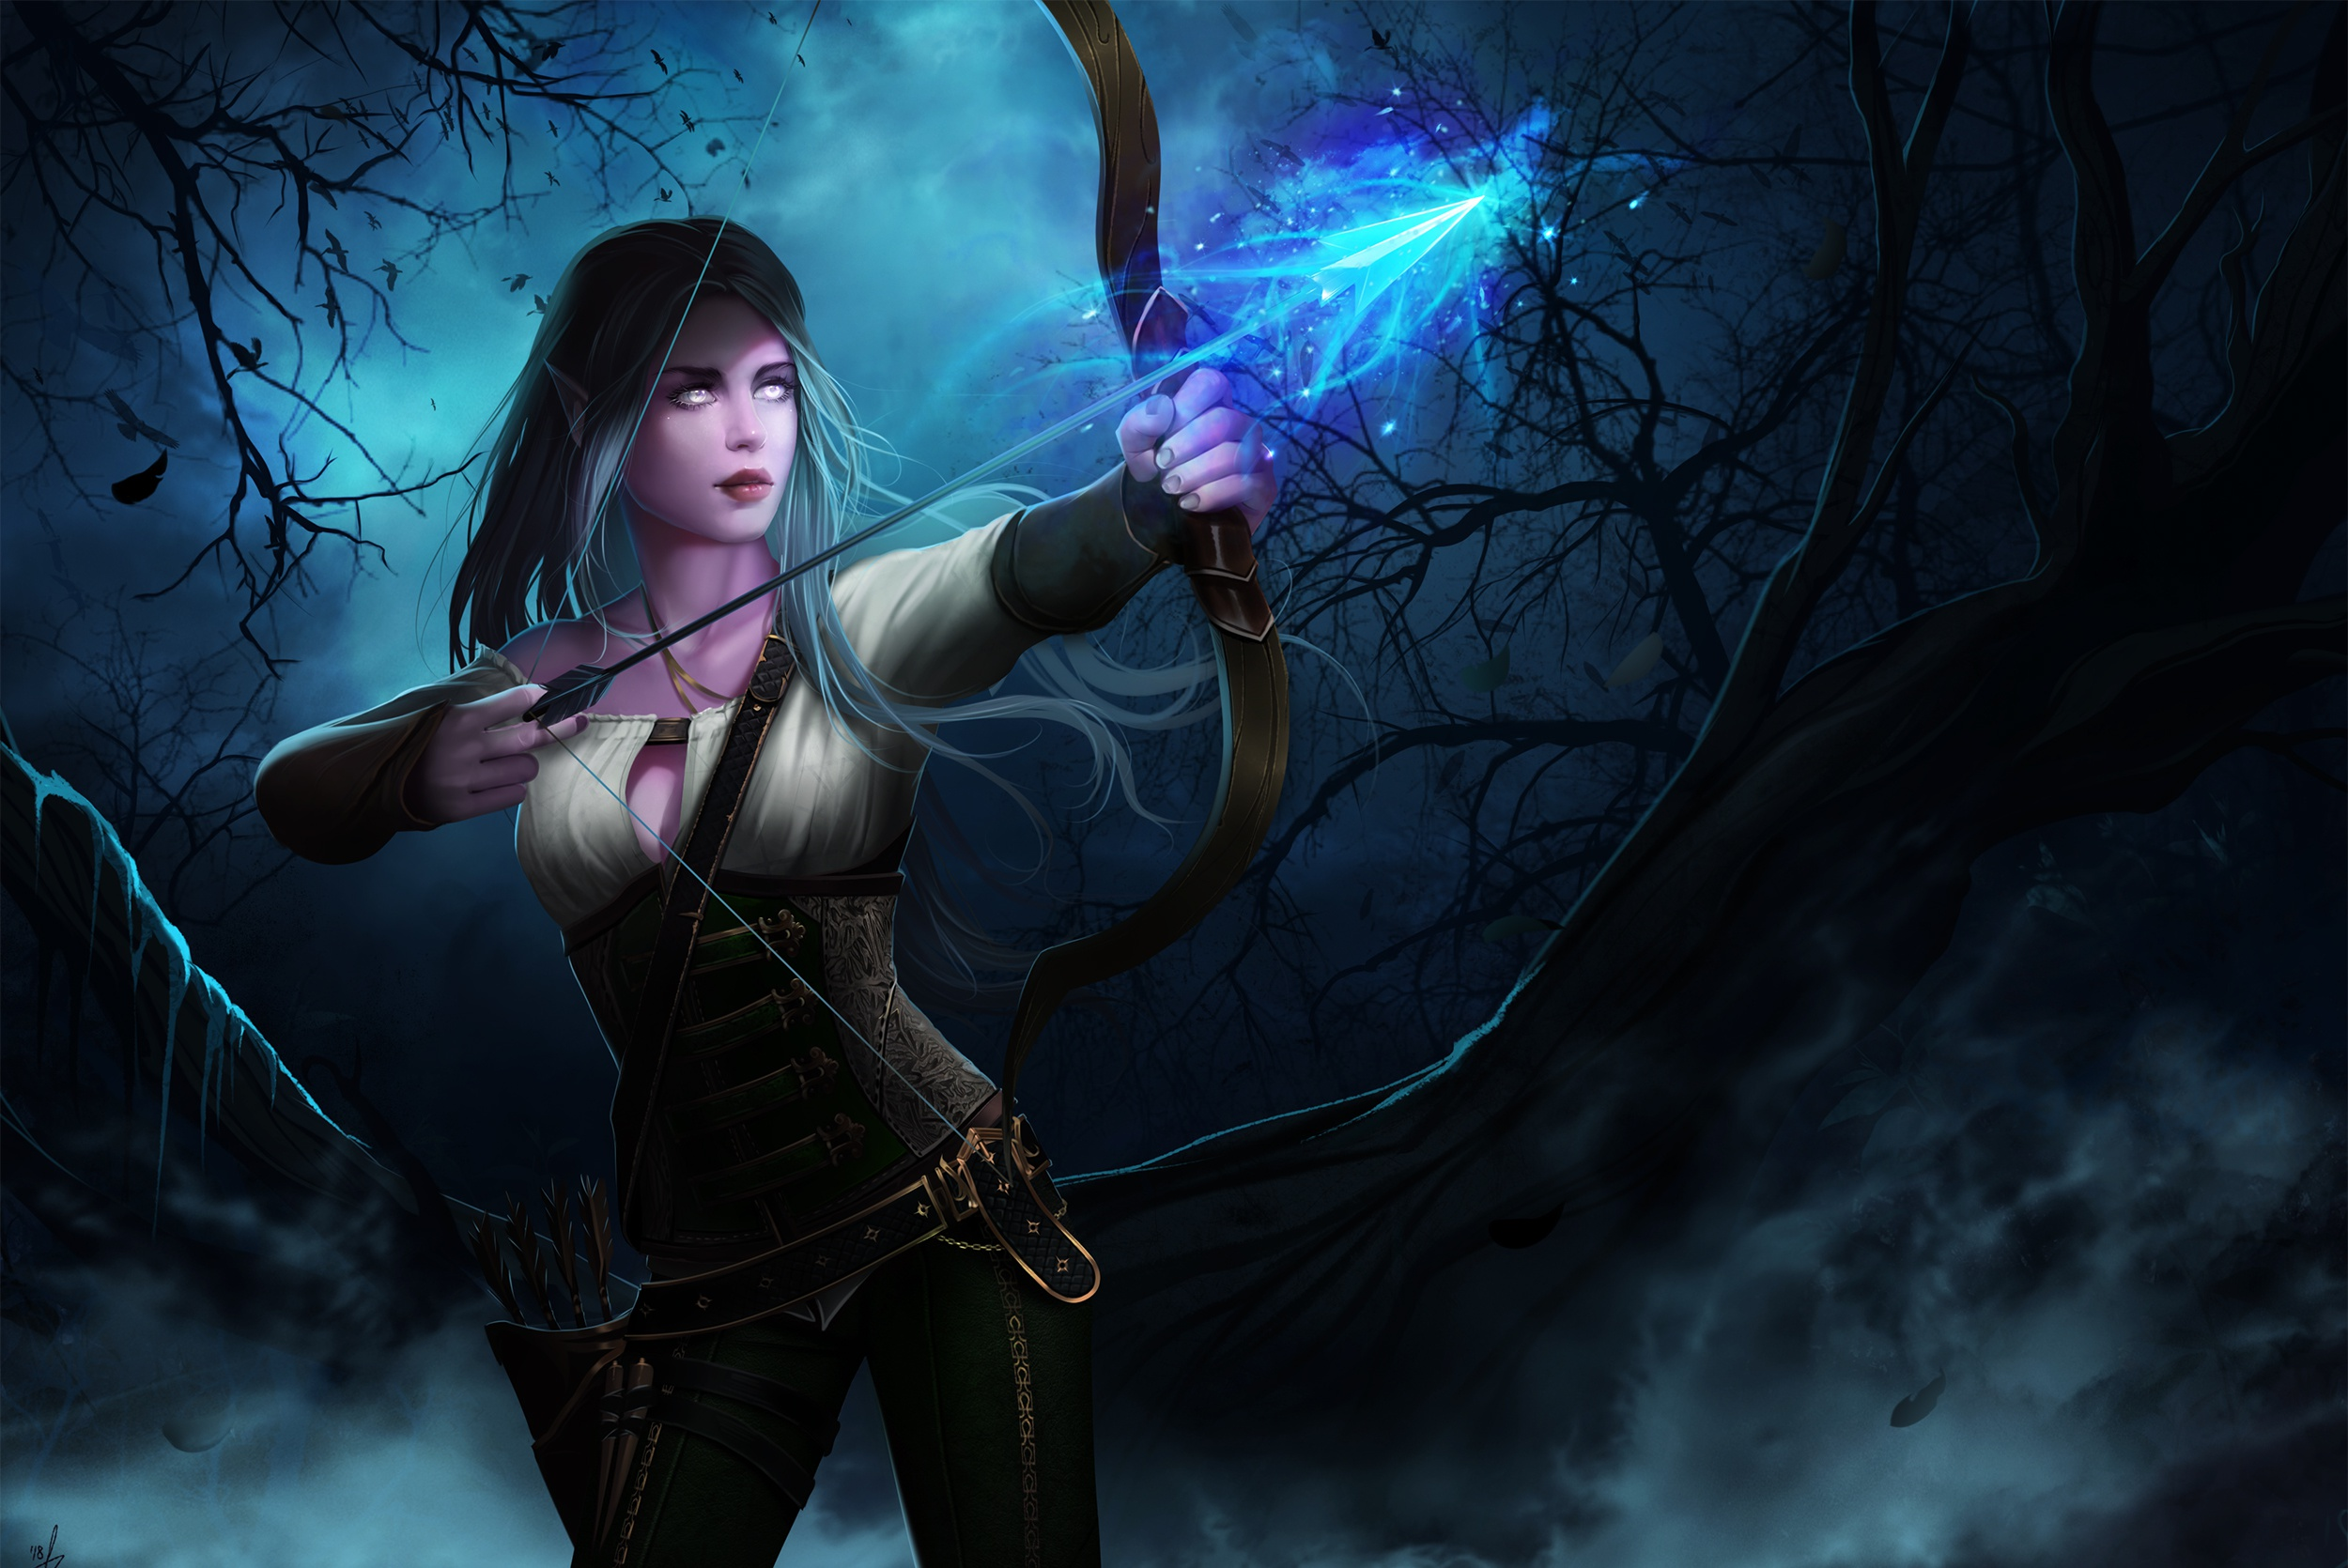 Archer Girl Fantasy 2 4k Hd Desktop Wallpaper For 4k Ultra: World Of Warcraft HD Wallpaper